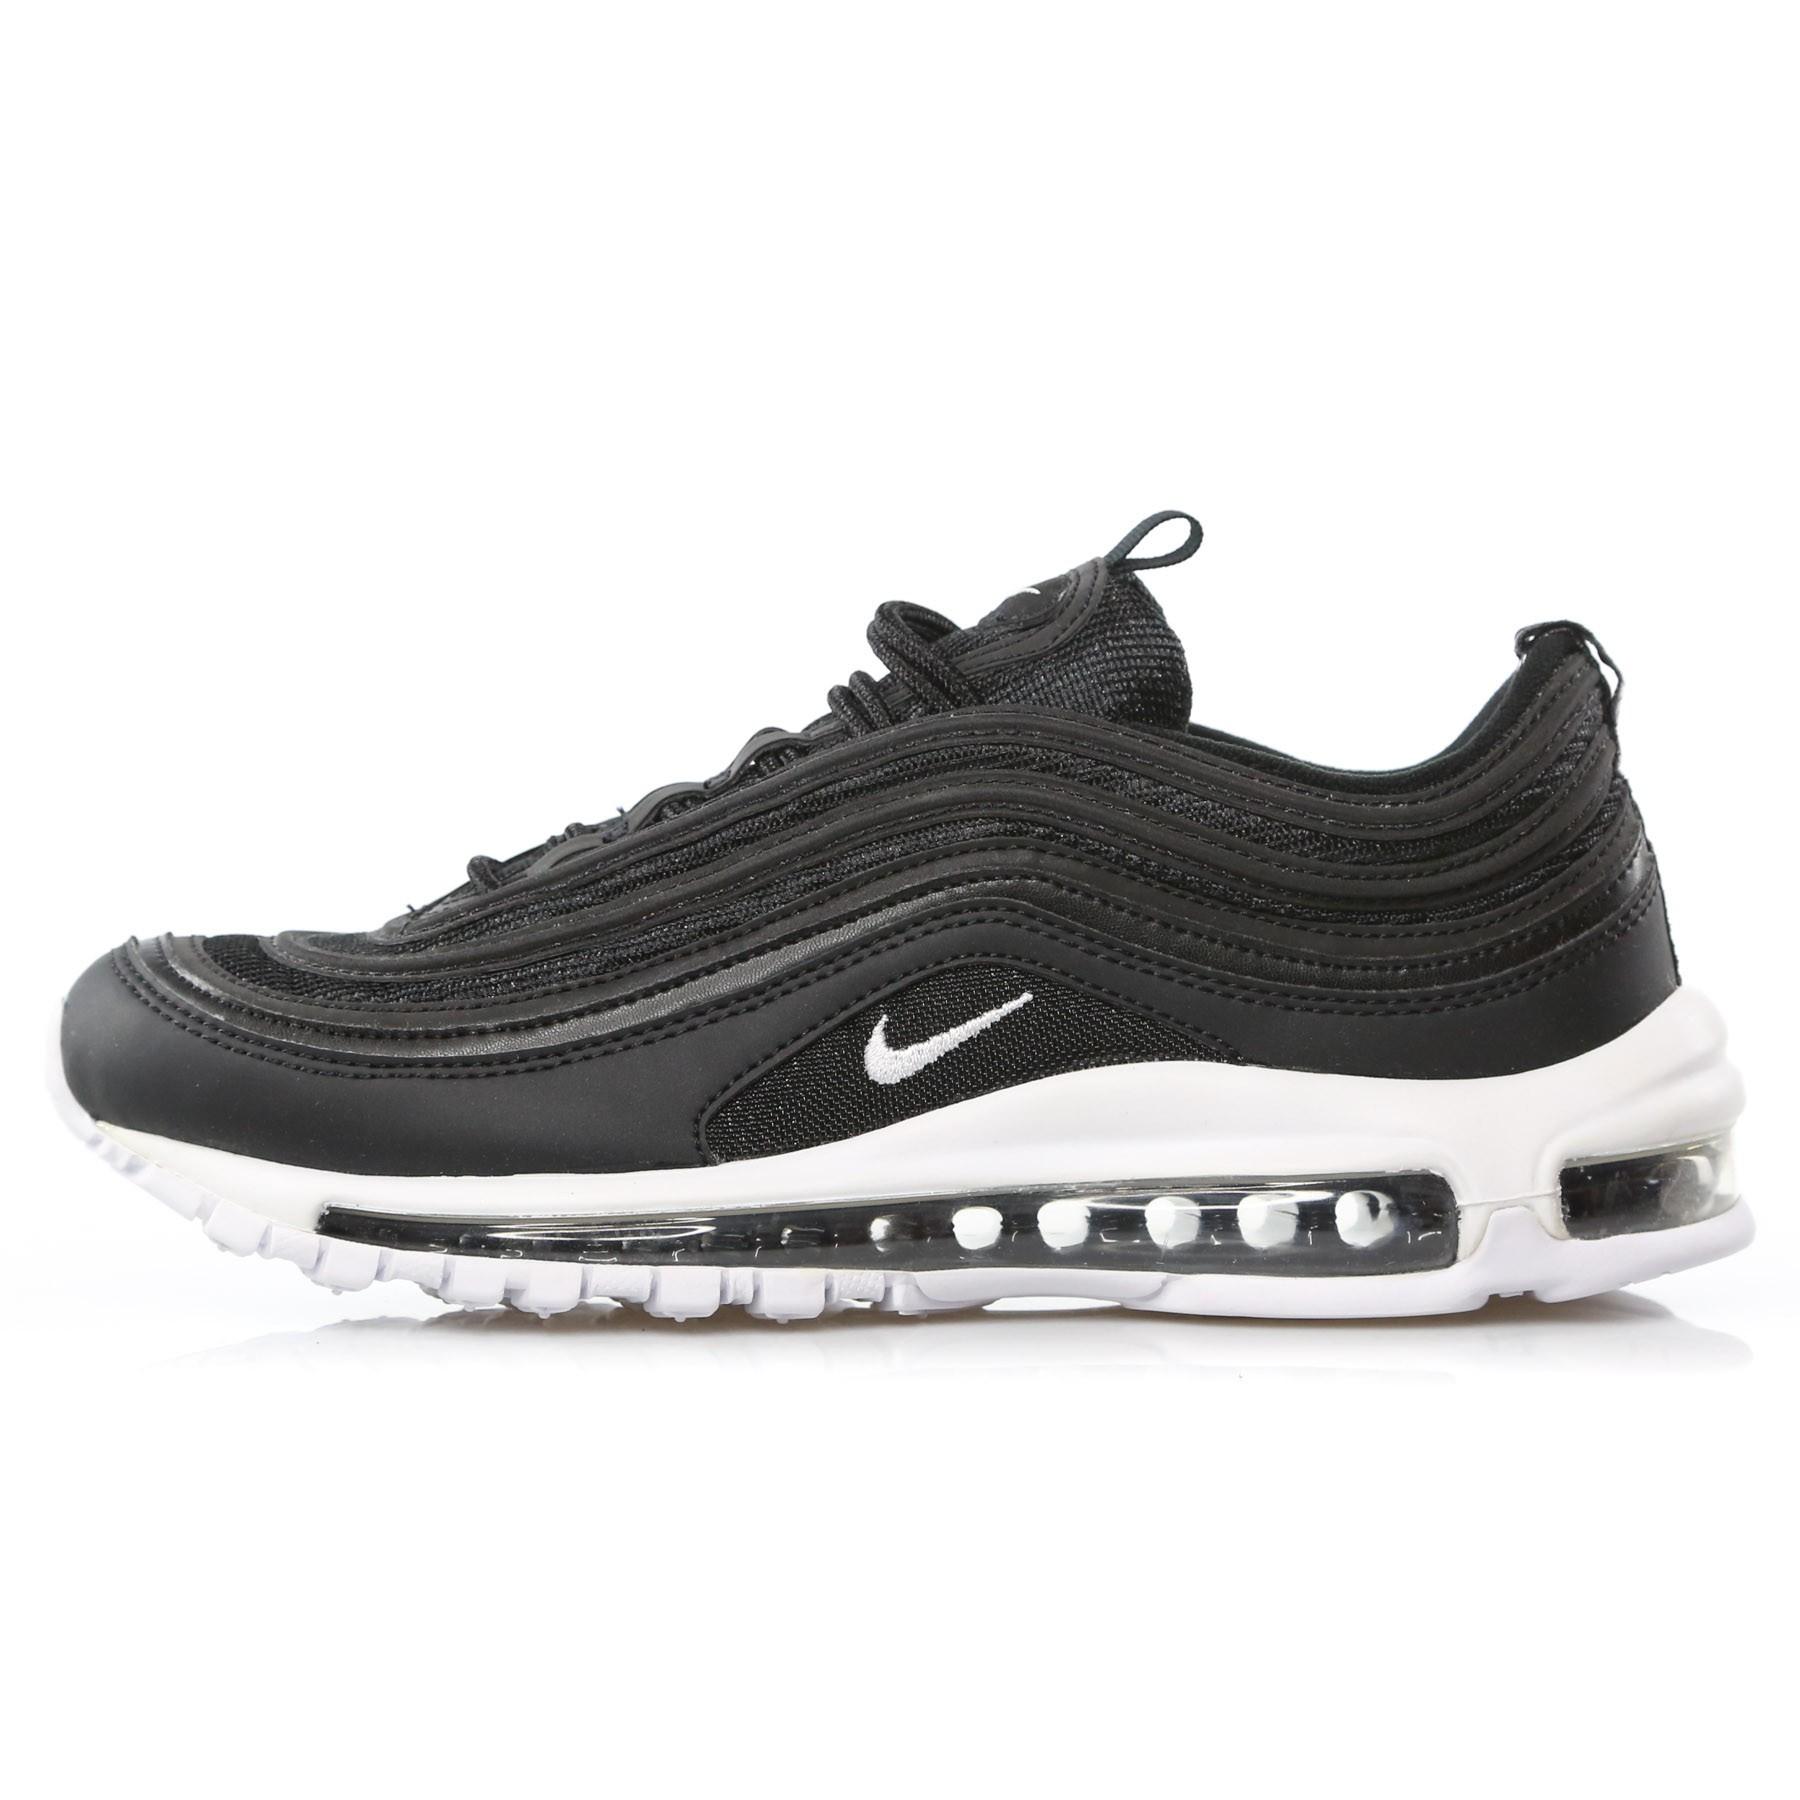 Nike Scarpa bassa uomo air max 97 921826-001 | Atipicishop.com